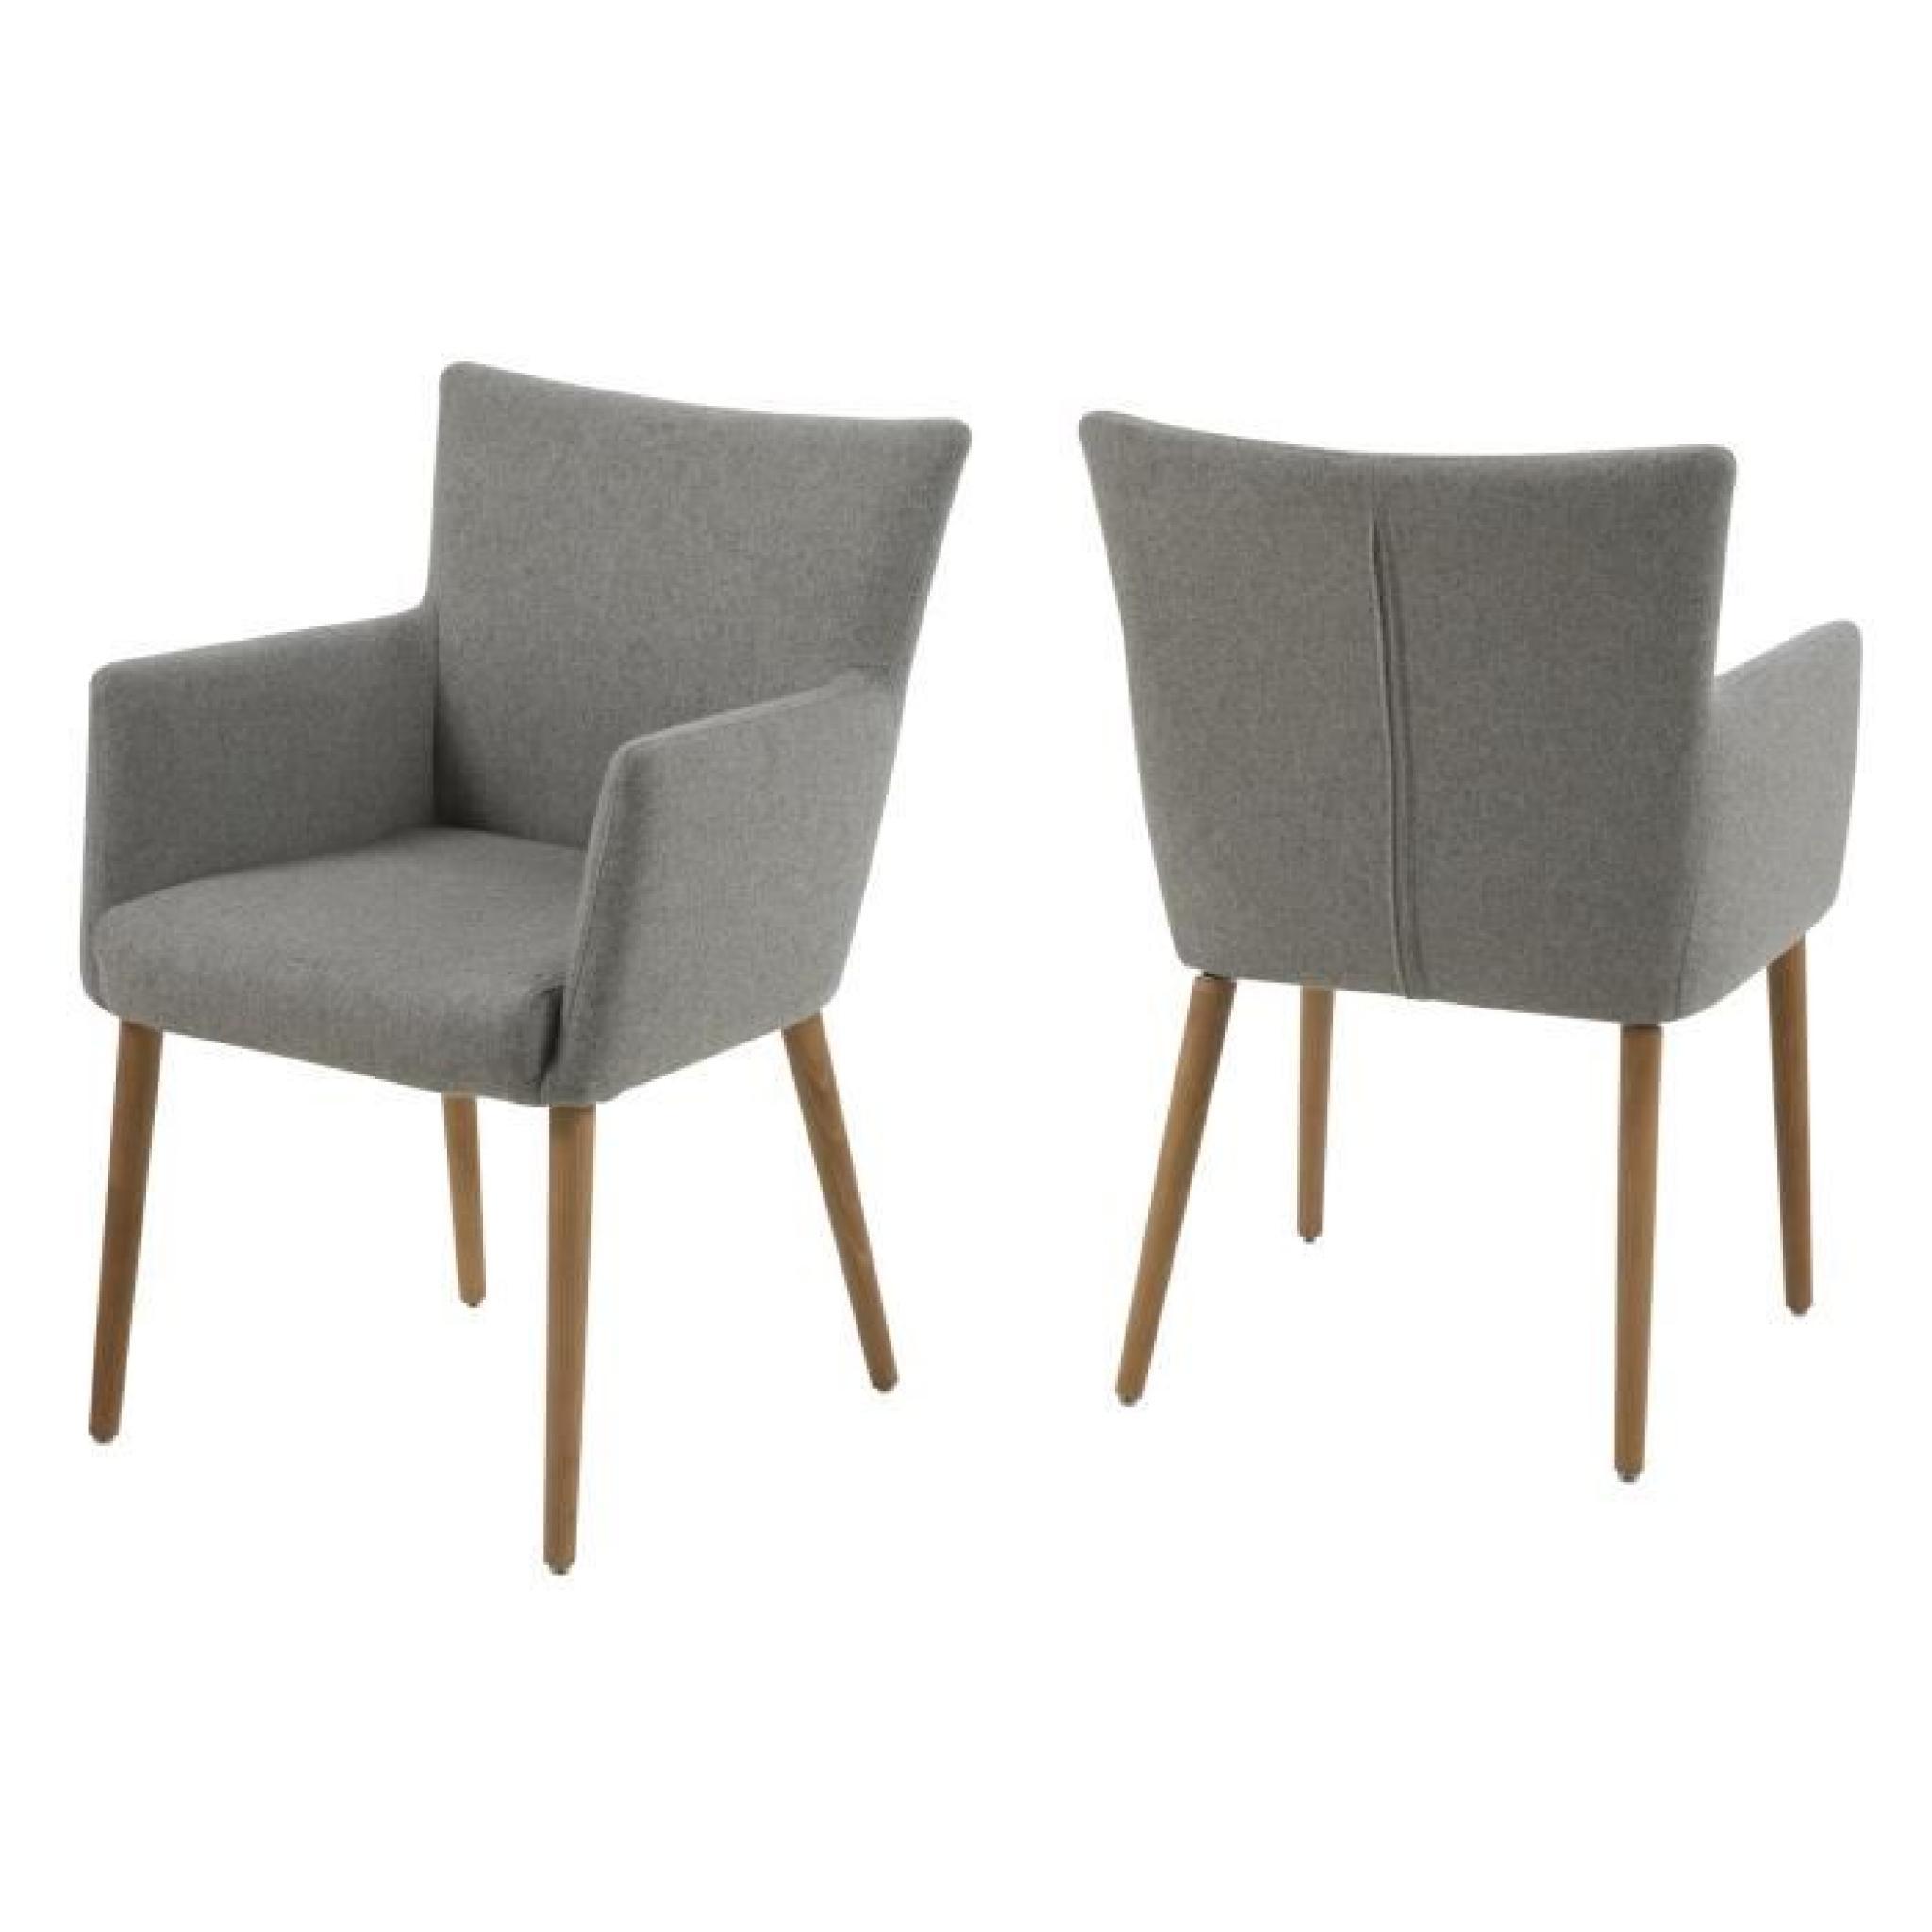 Chaise de salle manger nellie en tissu avec acco achat for Table de salle a manger avec chaise pas cher